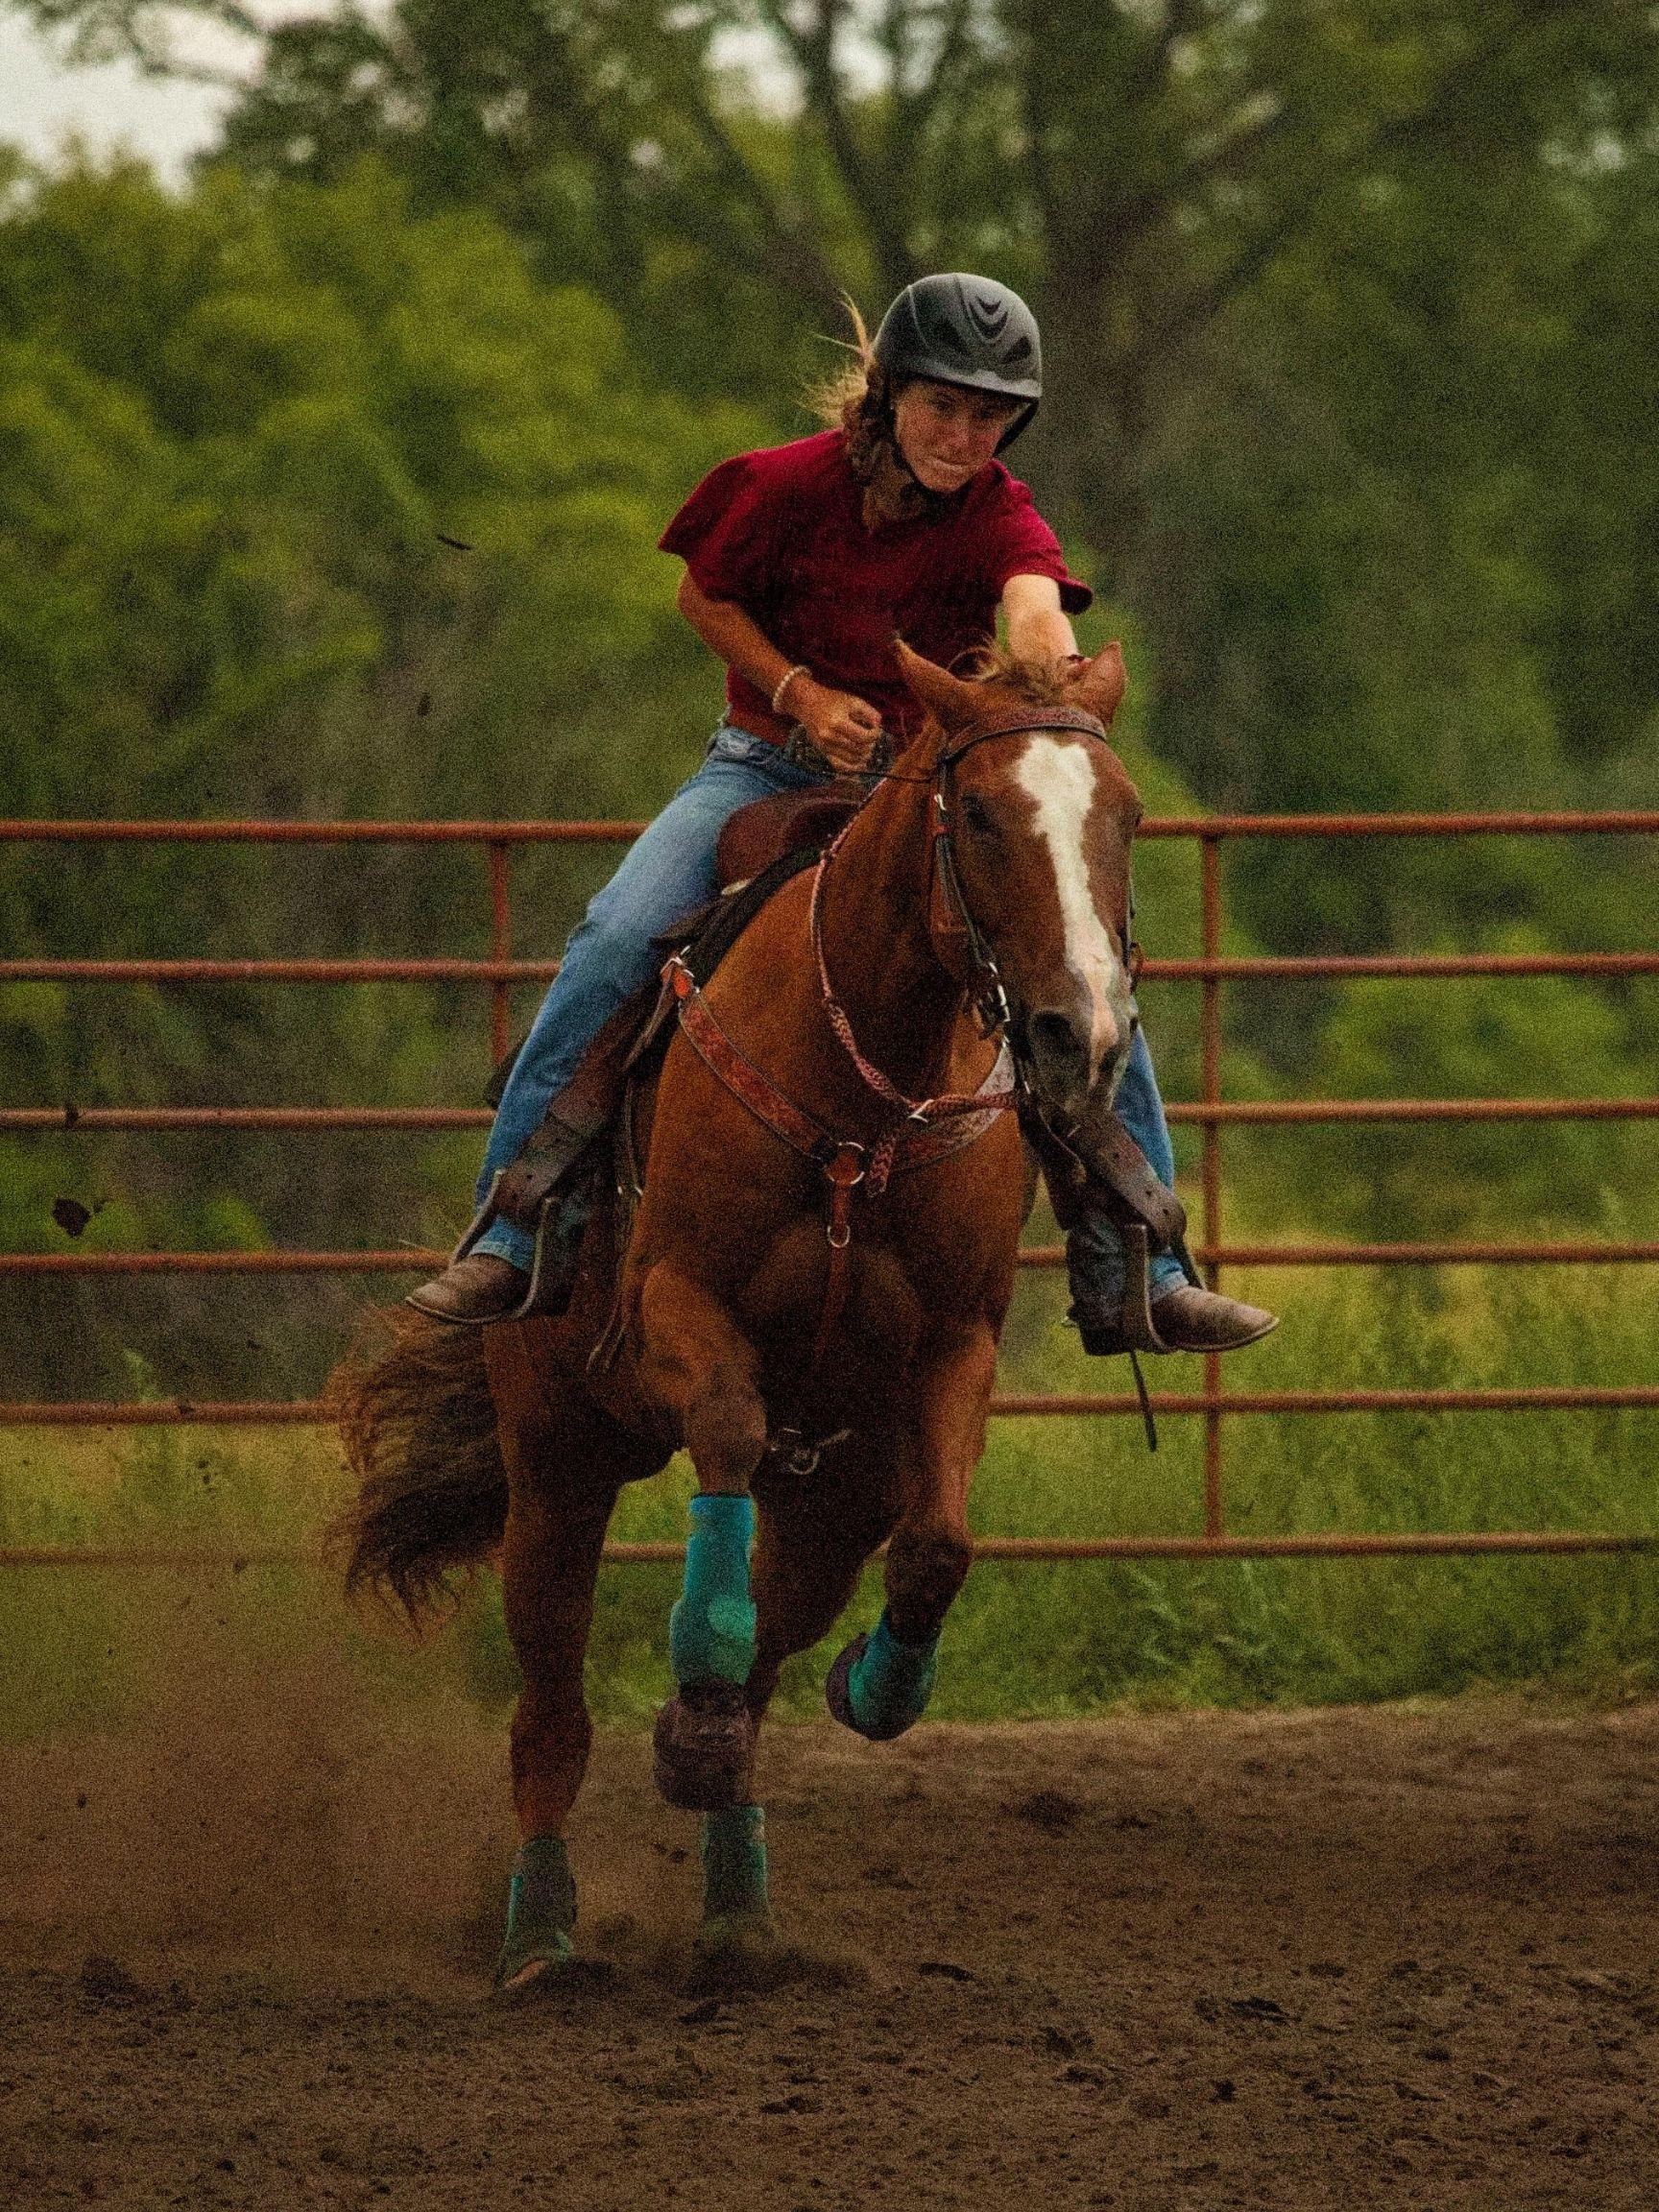 Horses are Fragile